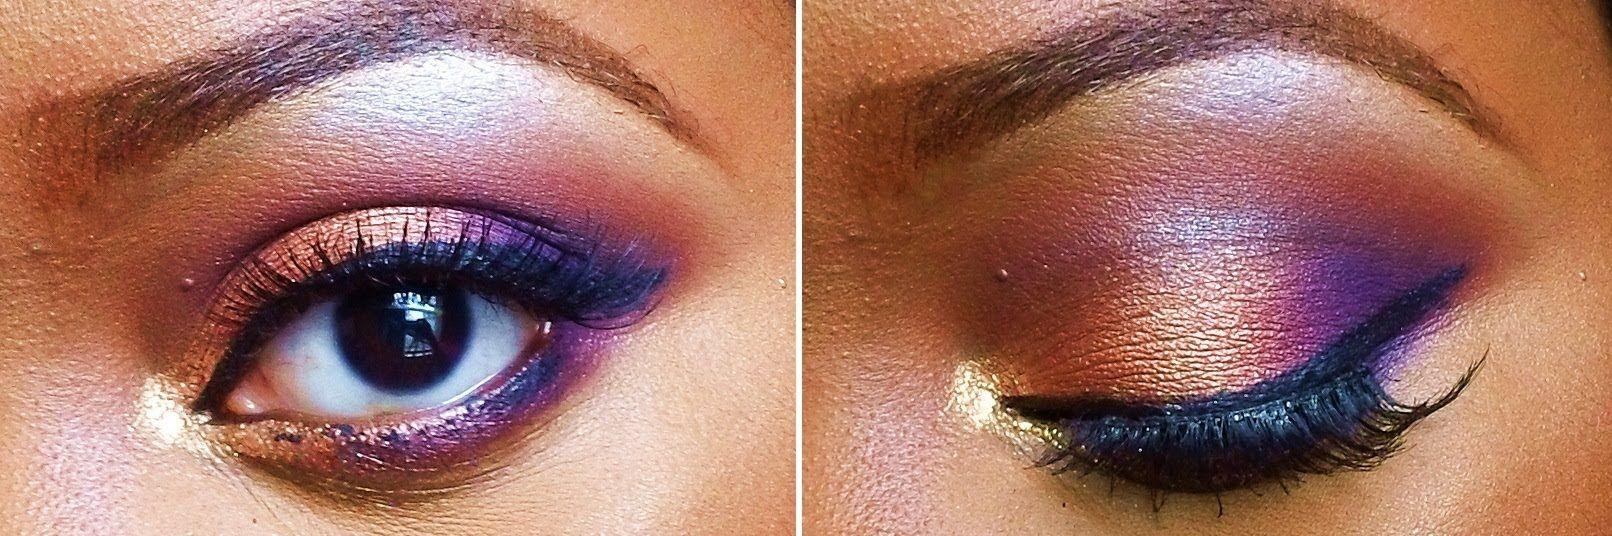 Makeup Tutorial: Smoking Purple in Autumn